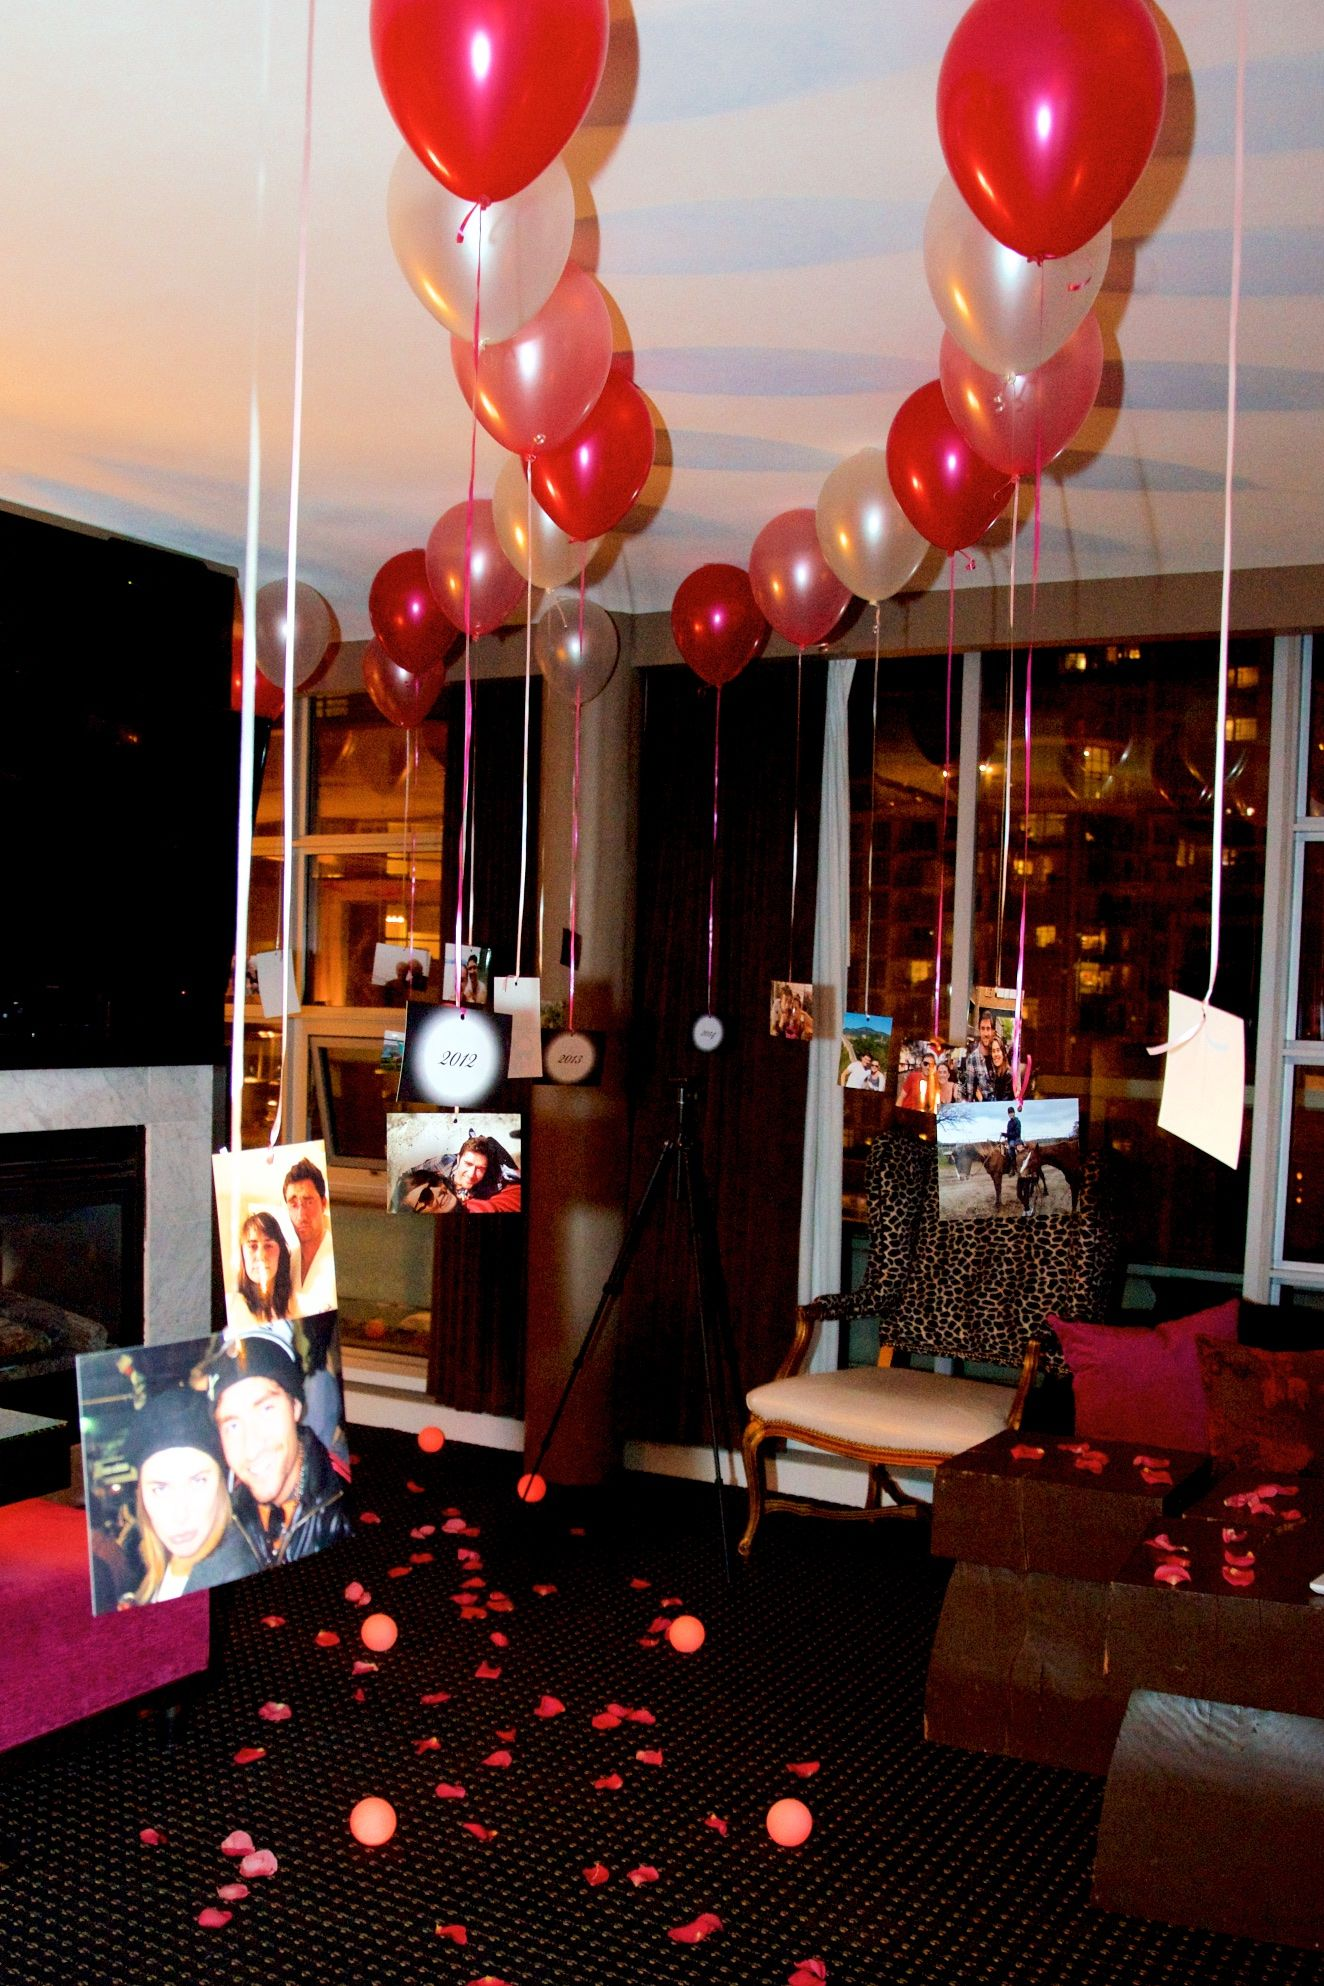 Hanging Couple Photos Room Decoration